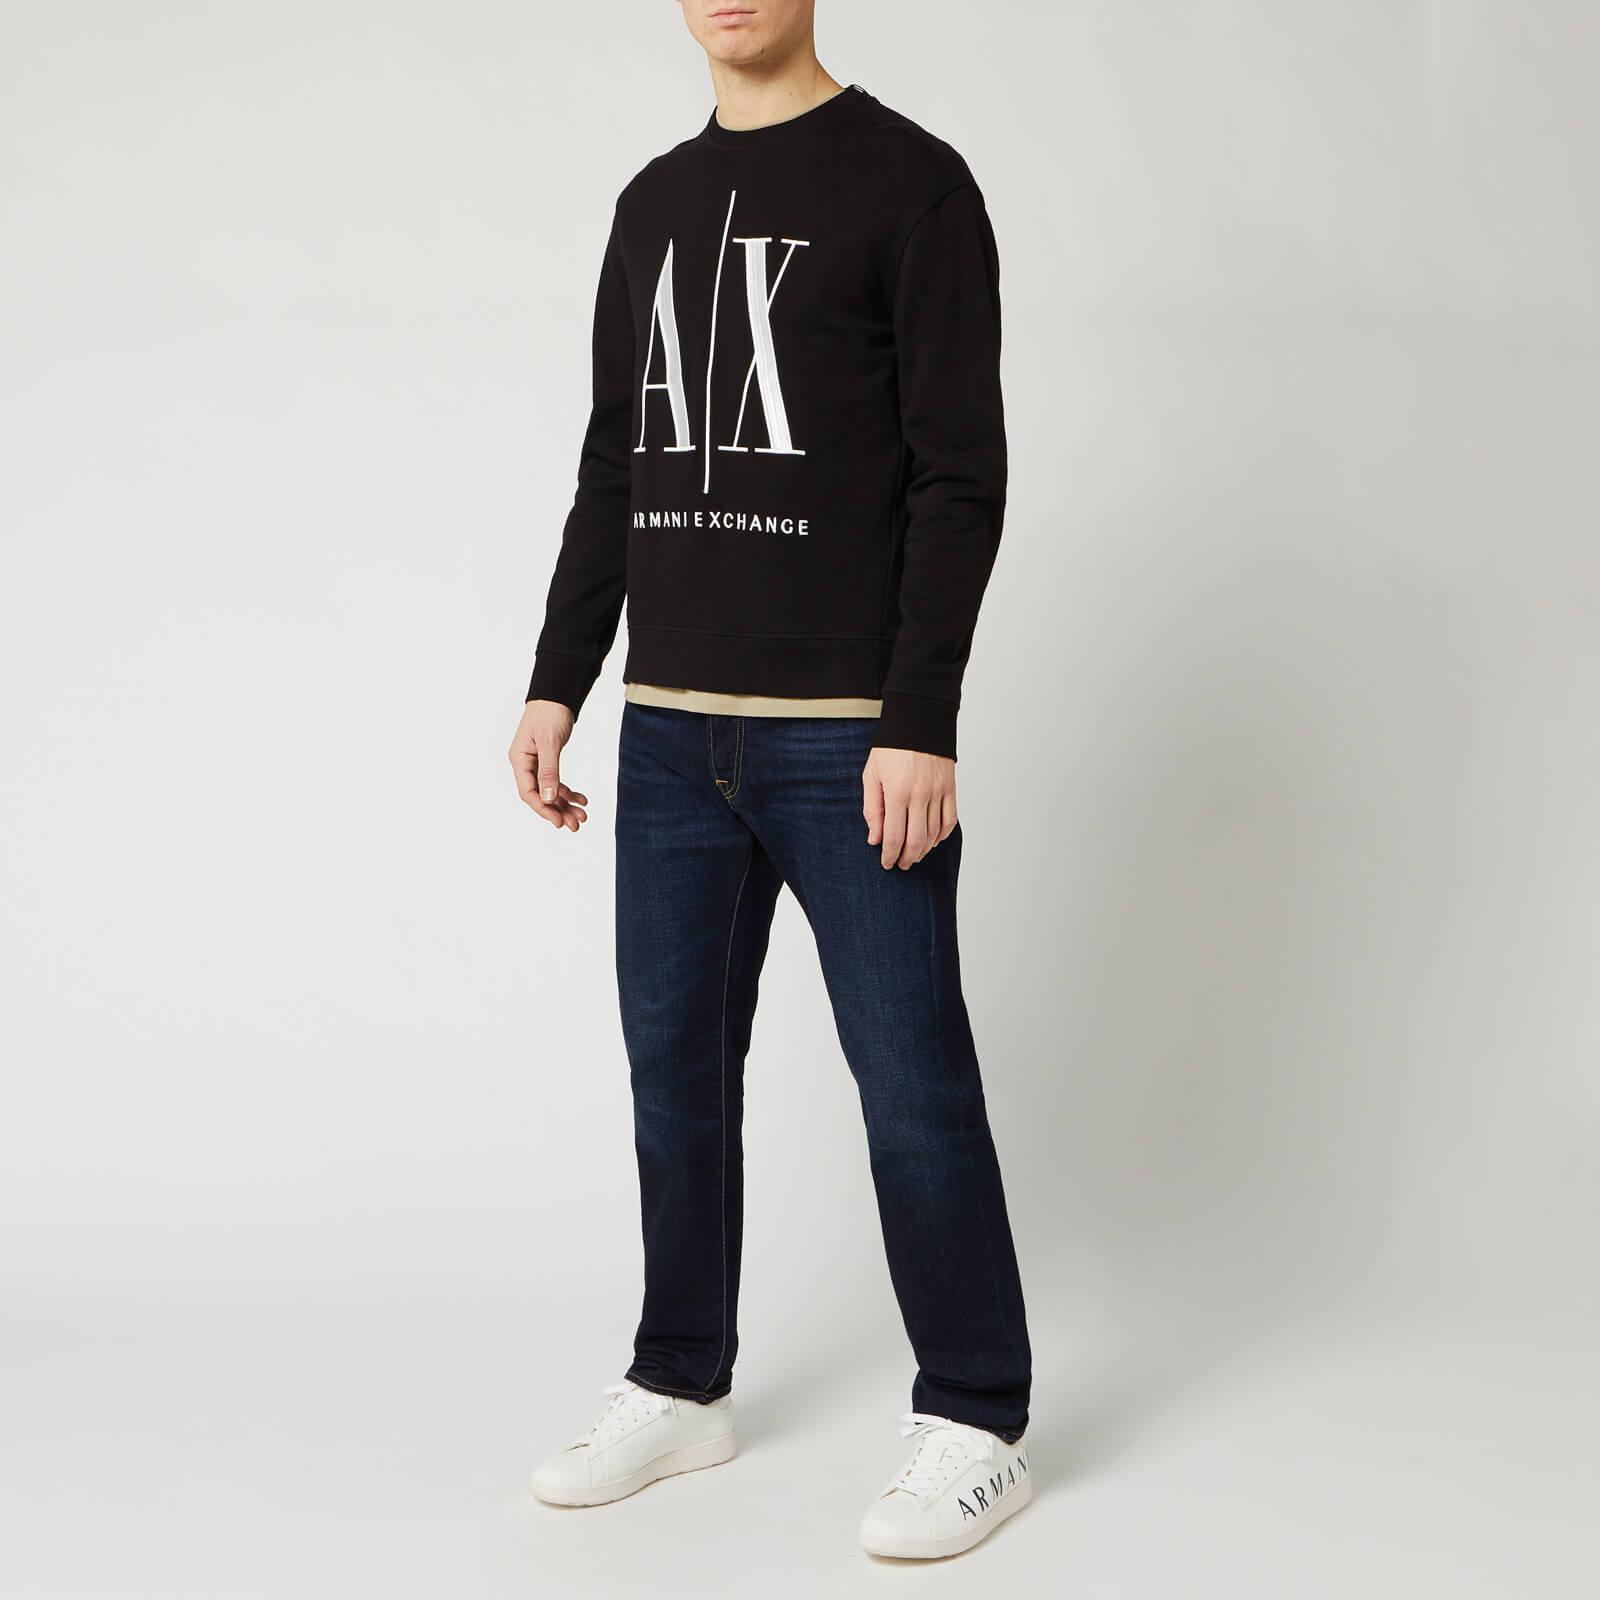 Armani Exchange Men's Large Ax Logo Sweatshirt - Black - S